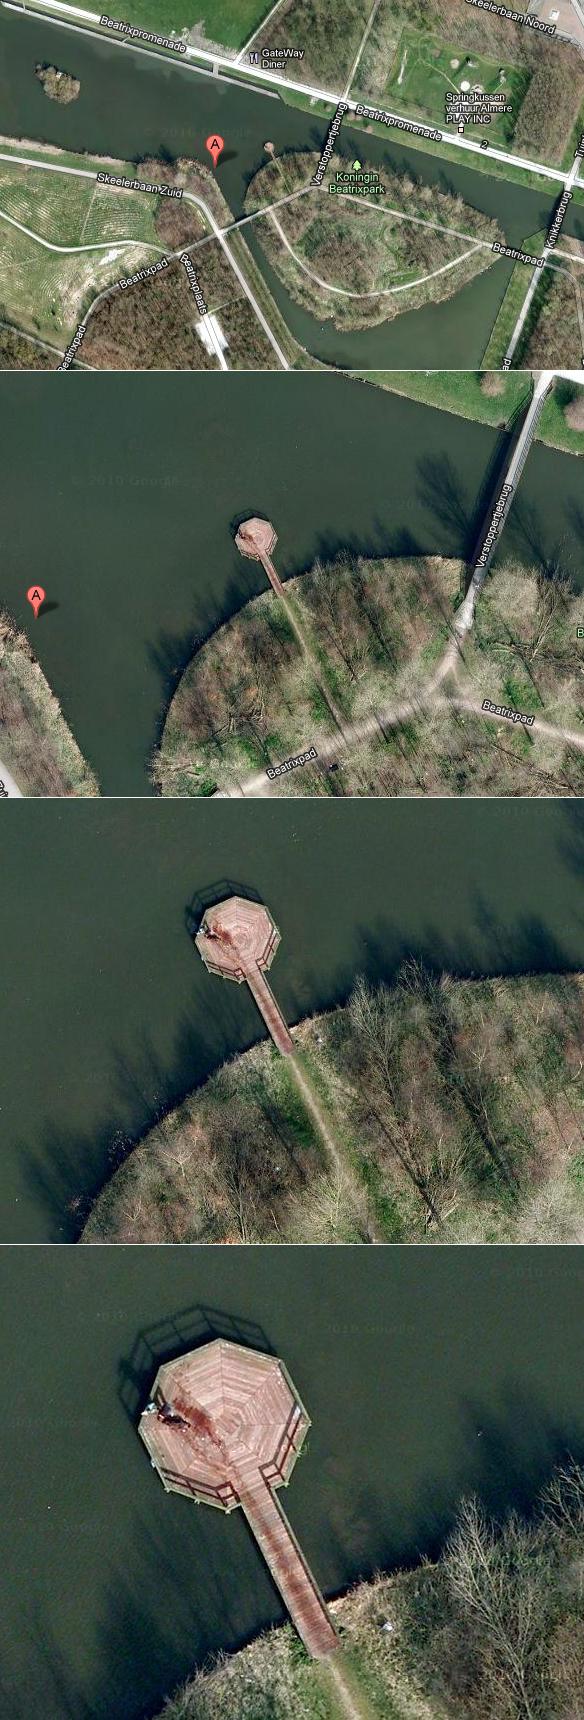 Murder on Google maps!. Koningin Beatrixpark, Beatrixpromenade, Almere-Stad, Almere, Nizozemska. Murder on Google maps! Koningin Beatrixpark Beatrixpromenade Almere-Stad Almere Nizozemska